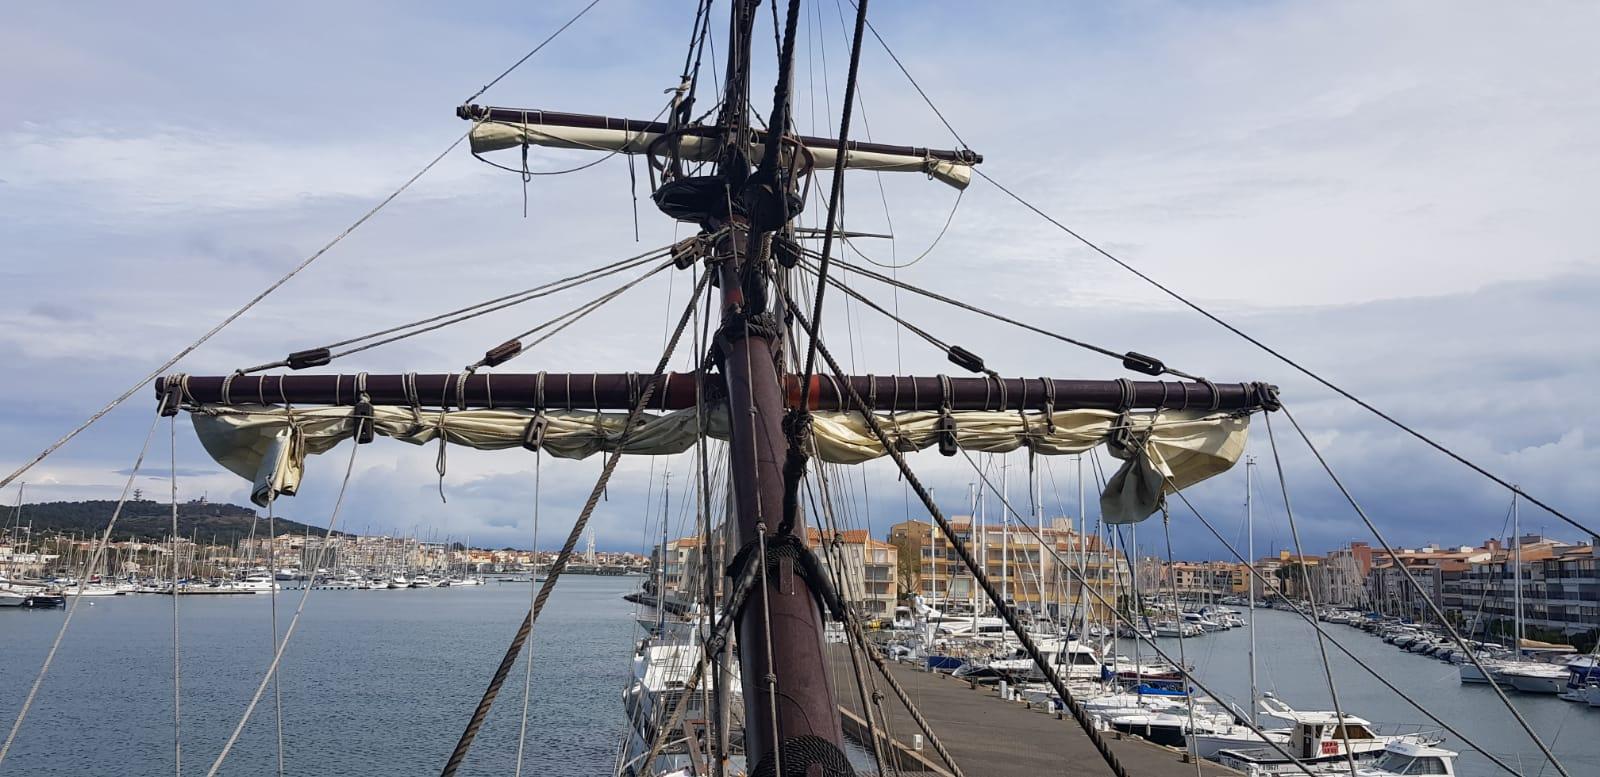 Le port du Cap d'Agde